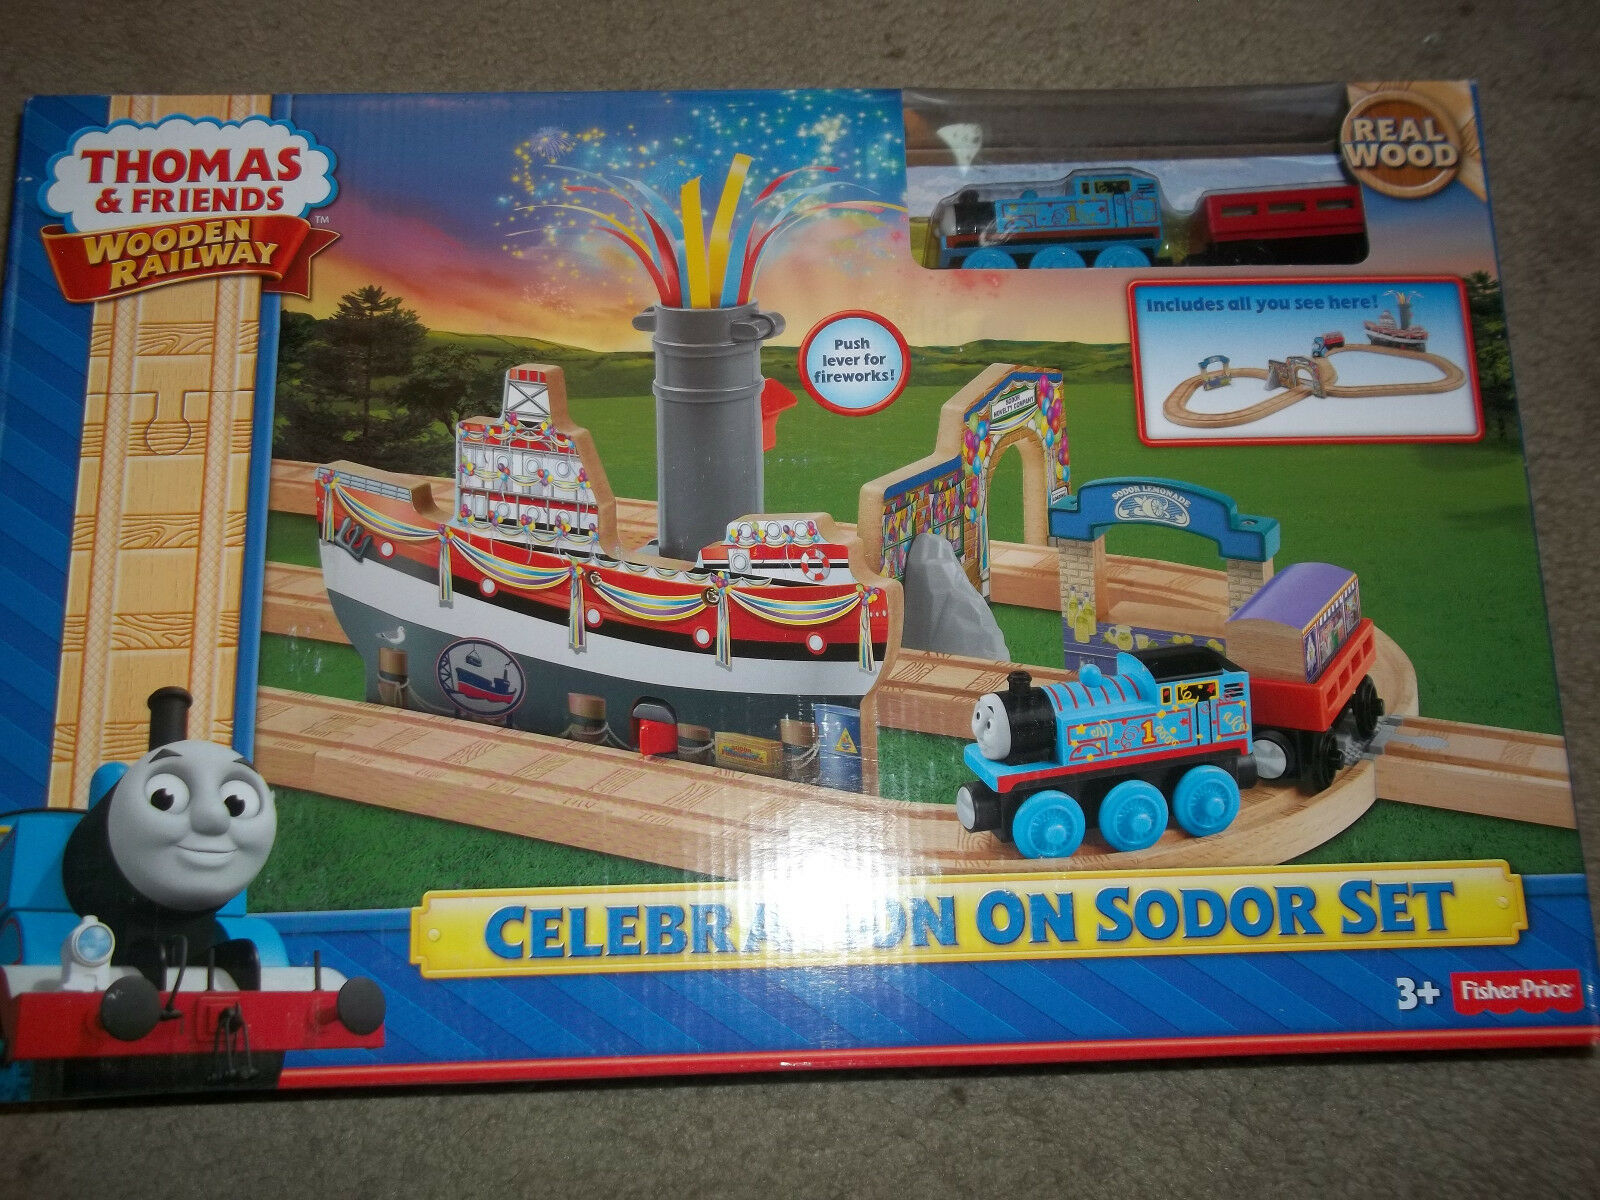 Thomas & Friends Wooden Railway Celebration On Sodor Set  New